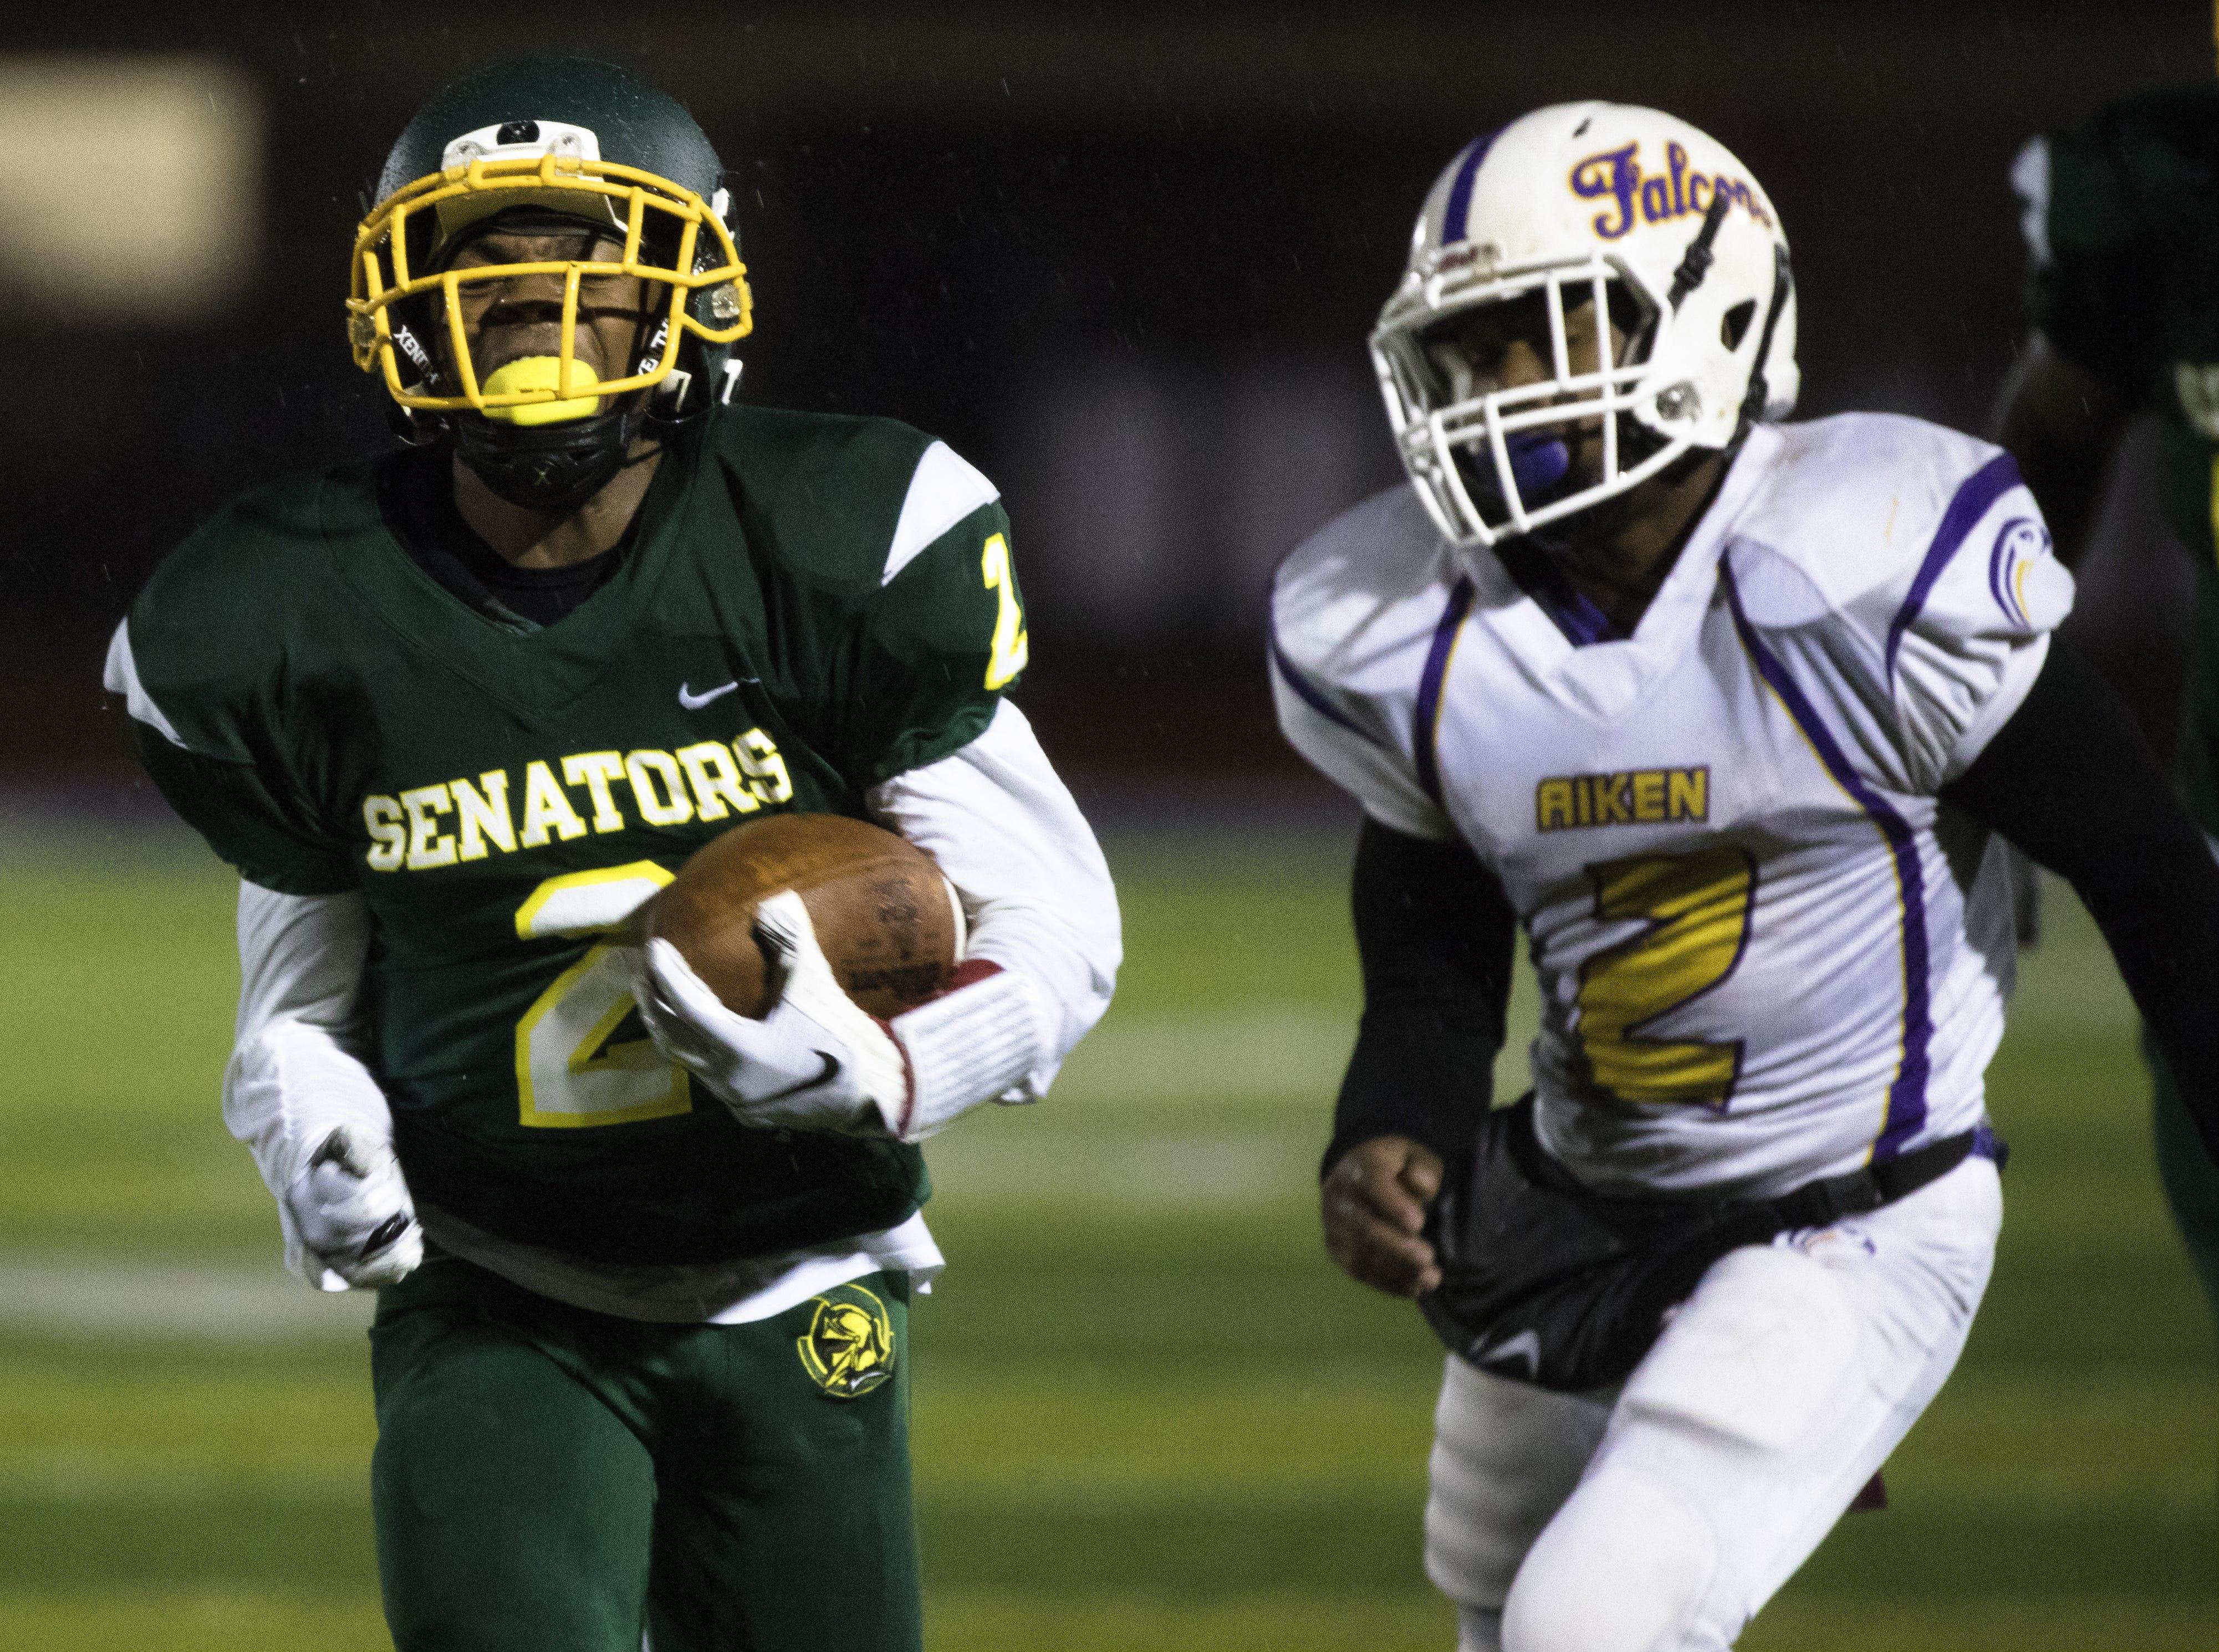 Taft's Demarco Bradley (2) scores a touchdown during the OHSAA final regular season game between Taft High School and Aiken High School on Friday, Oct. 26, 2018 at Stargel Stadium in the West End.